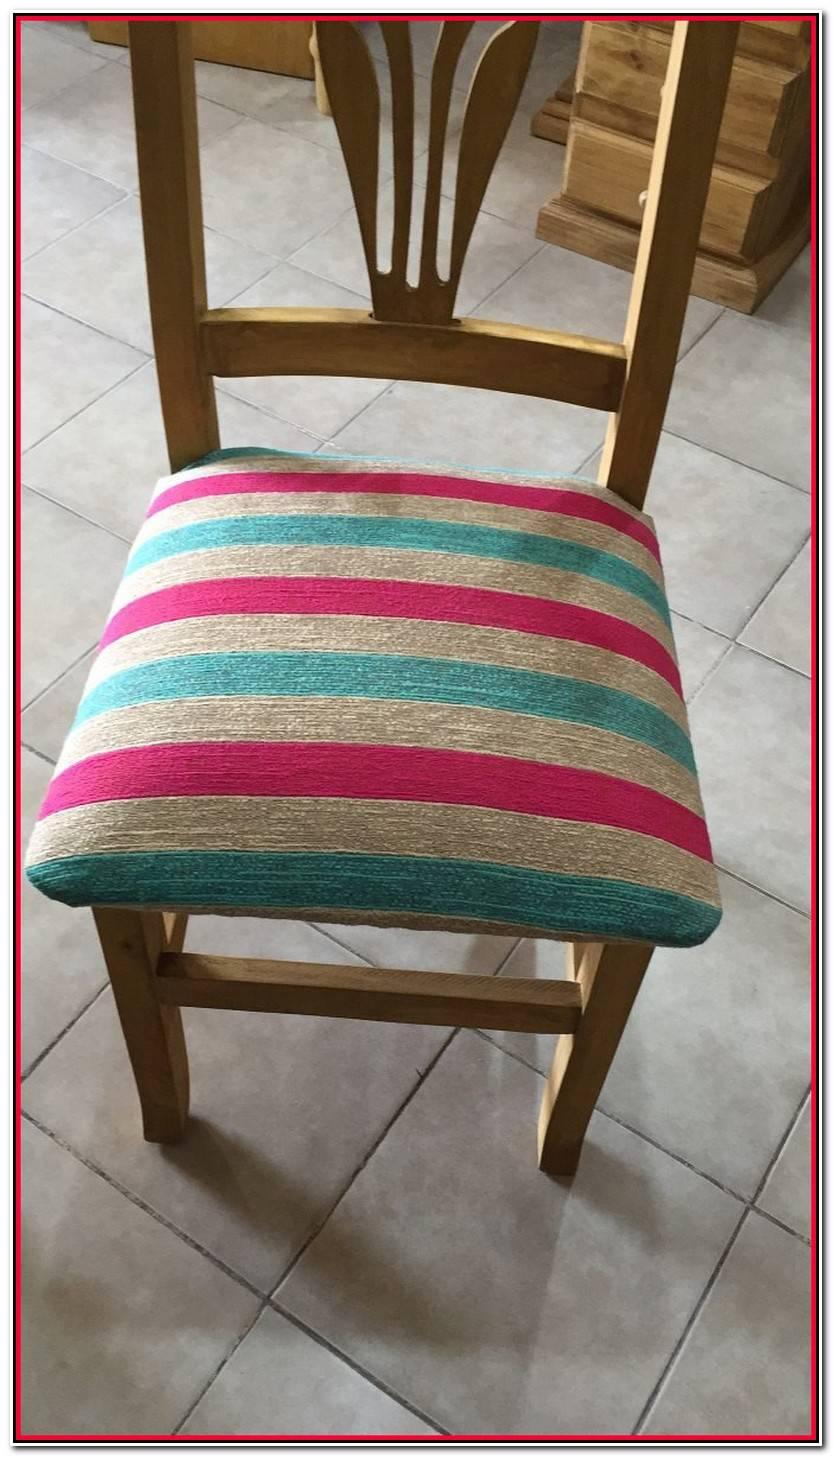 Impresionante Tapizado Sillas Imagen De Silla Decorativo